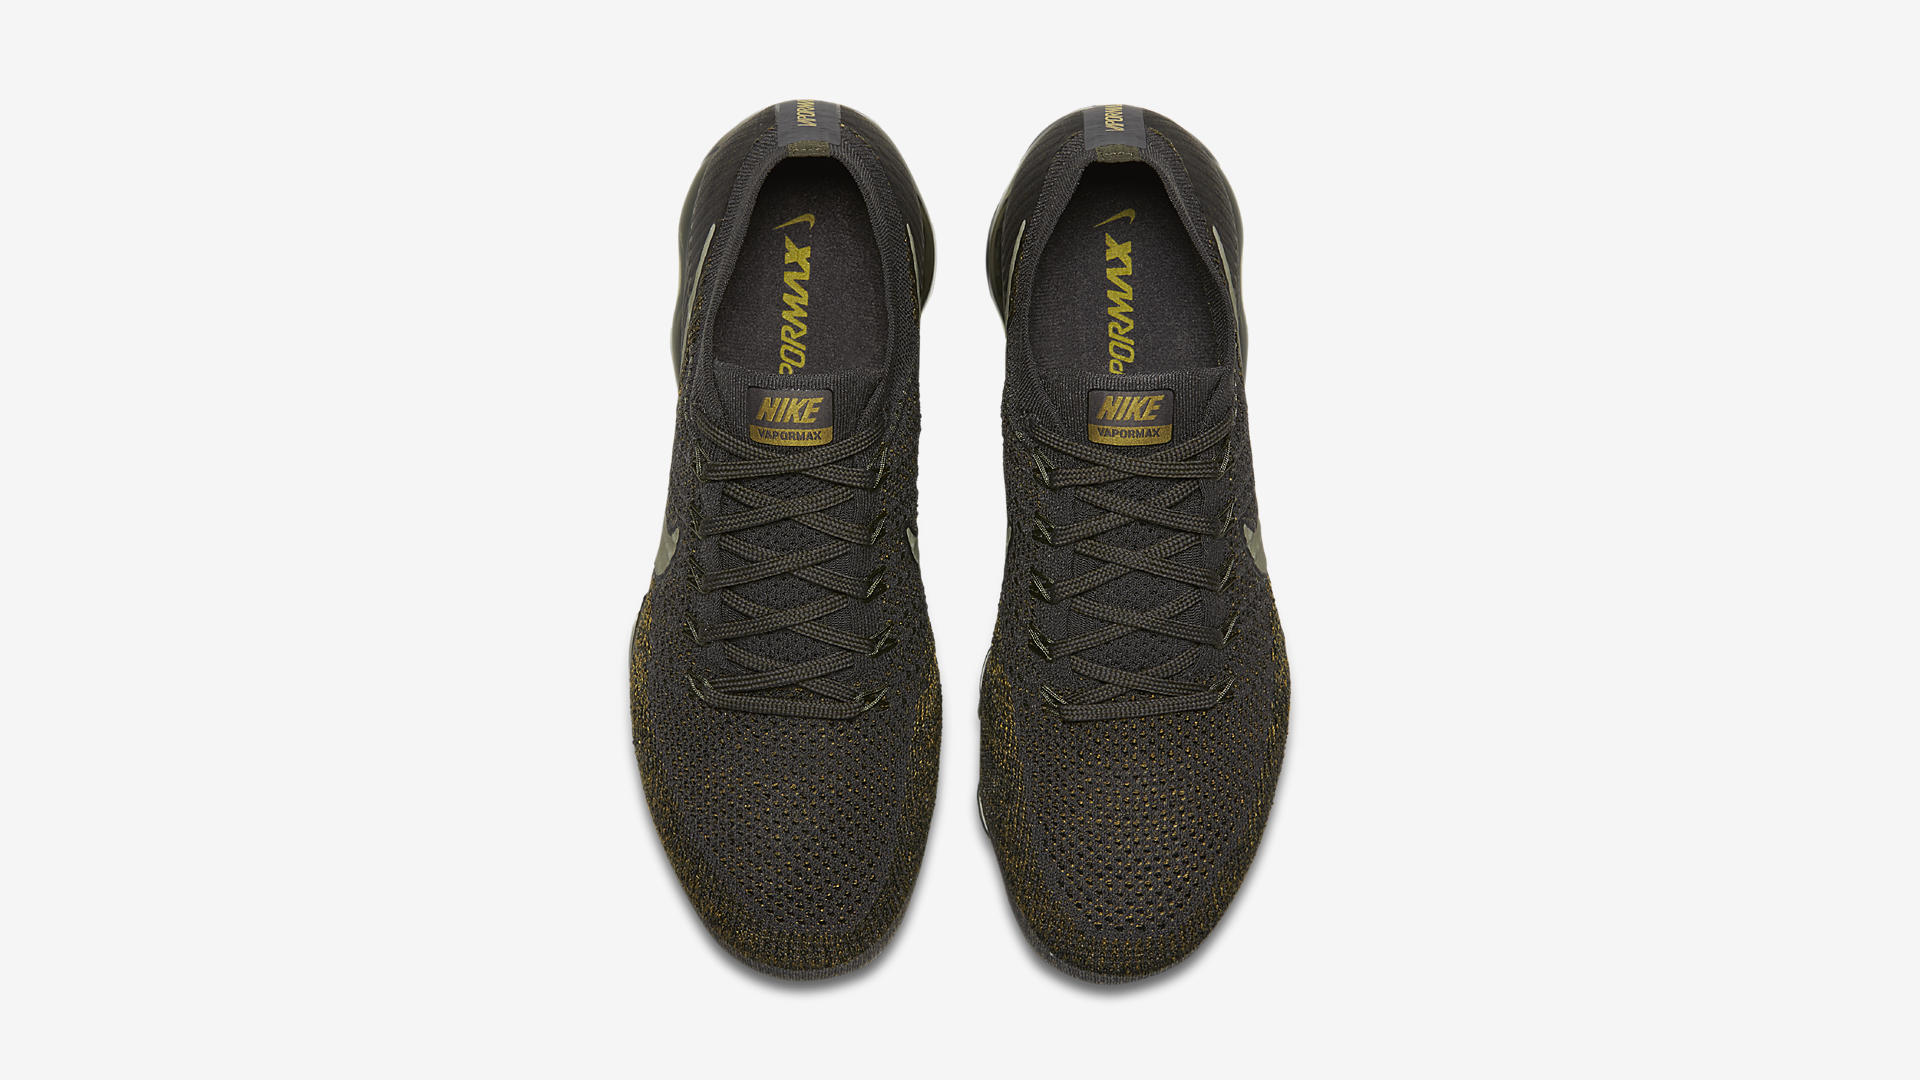 Nike Air VaporMax Midnight Fog 899473 004 2